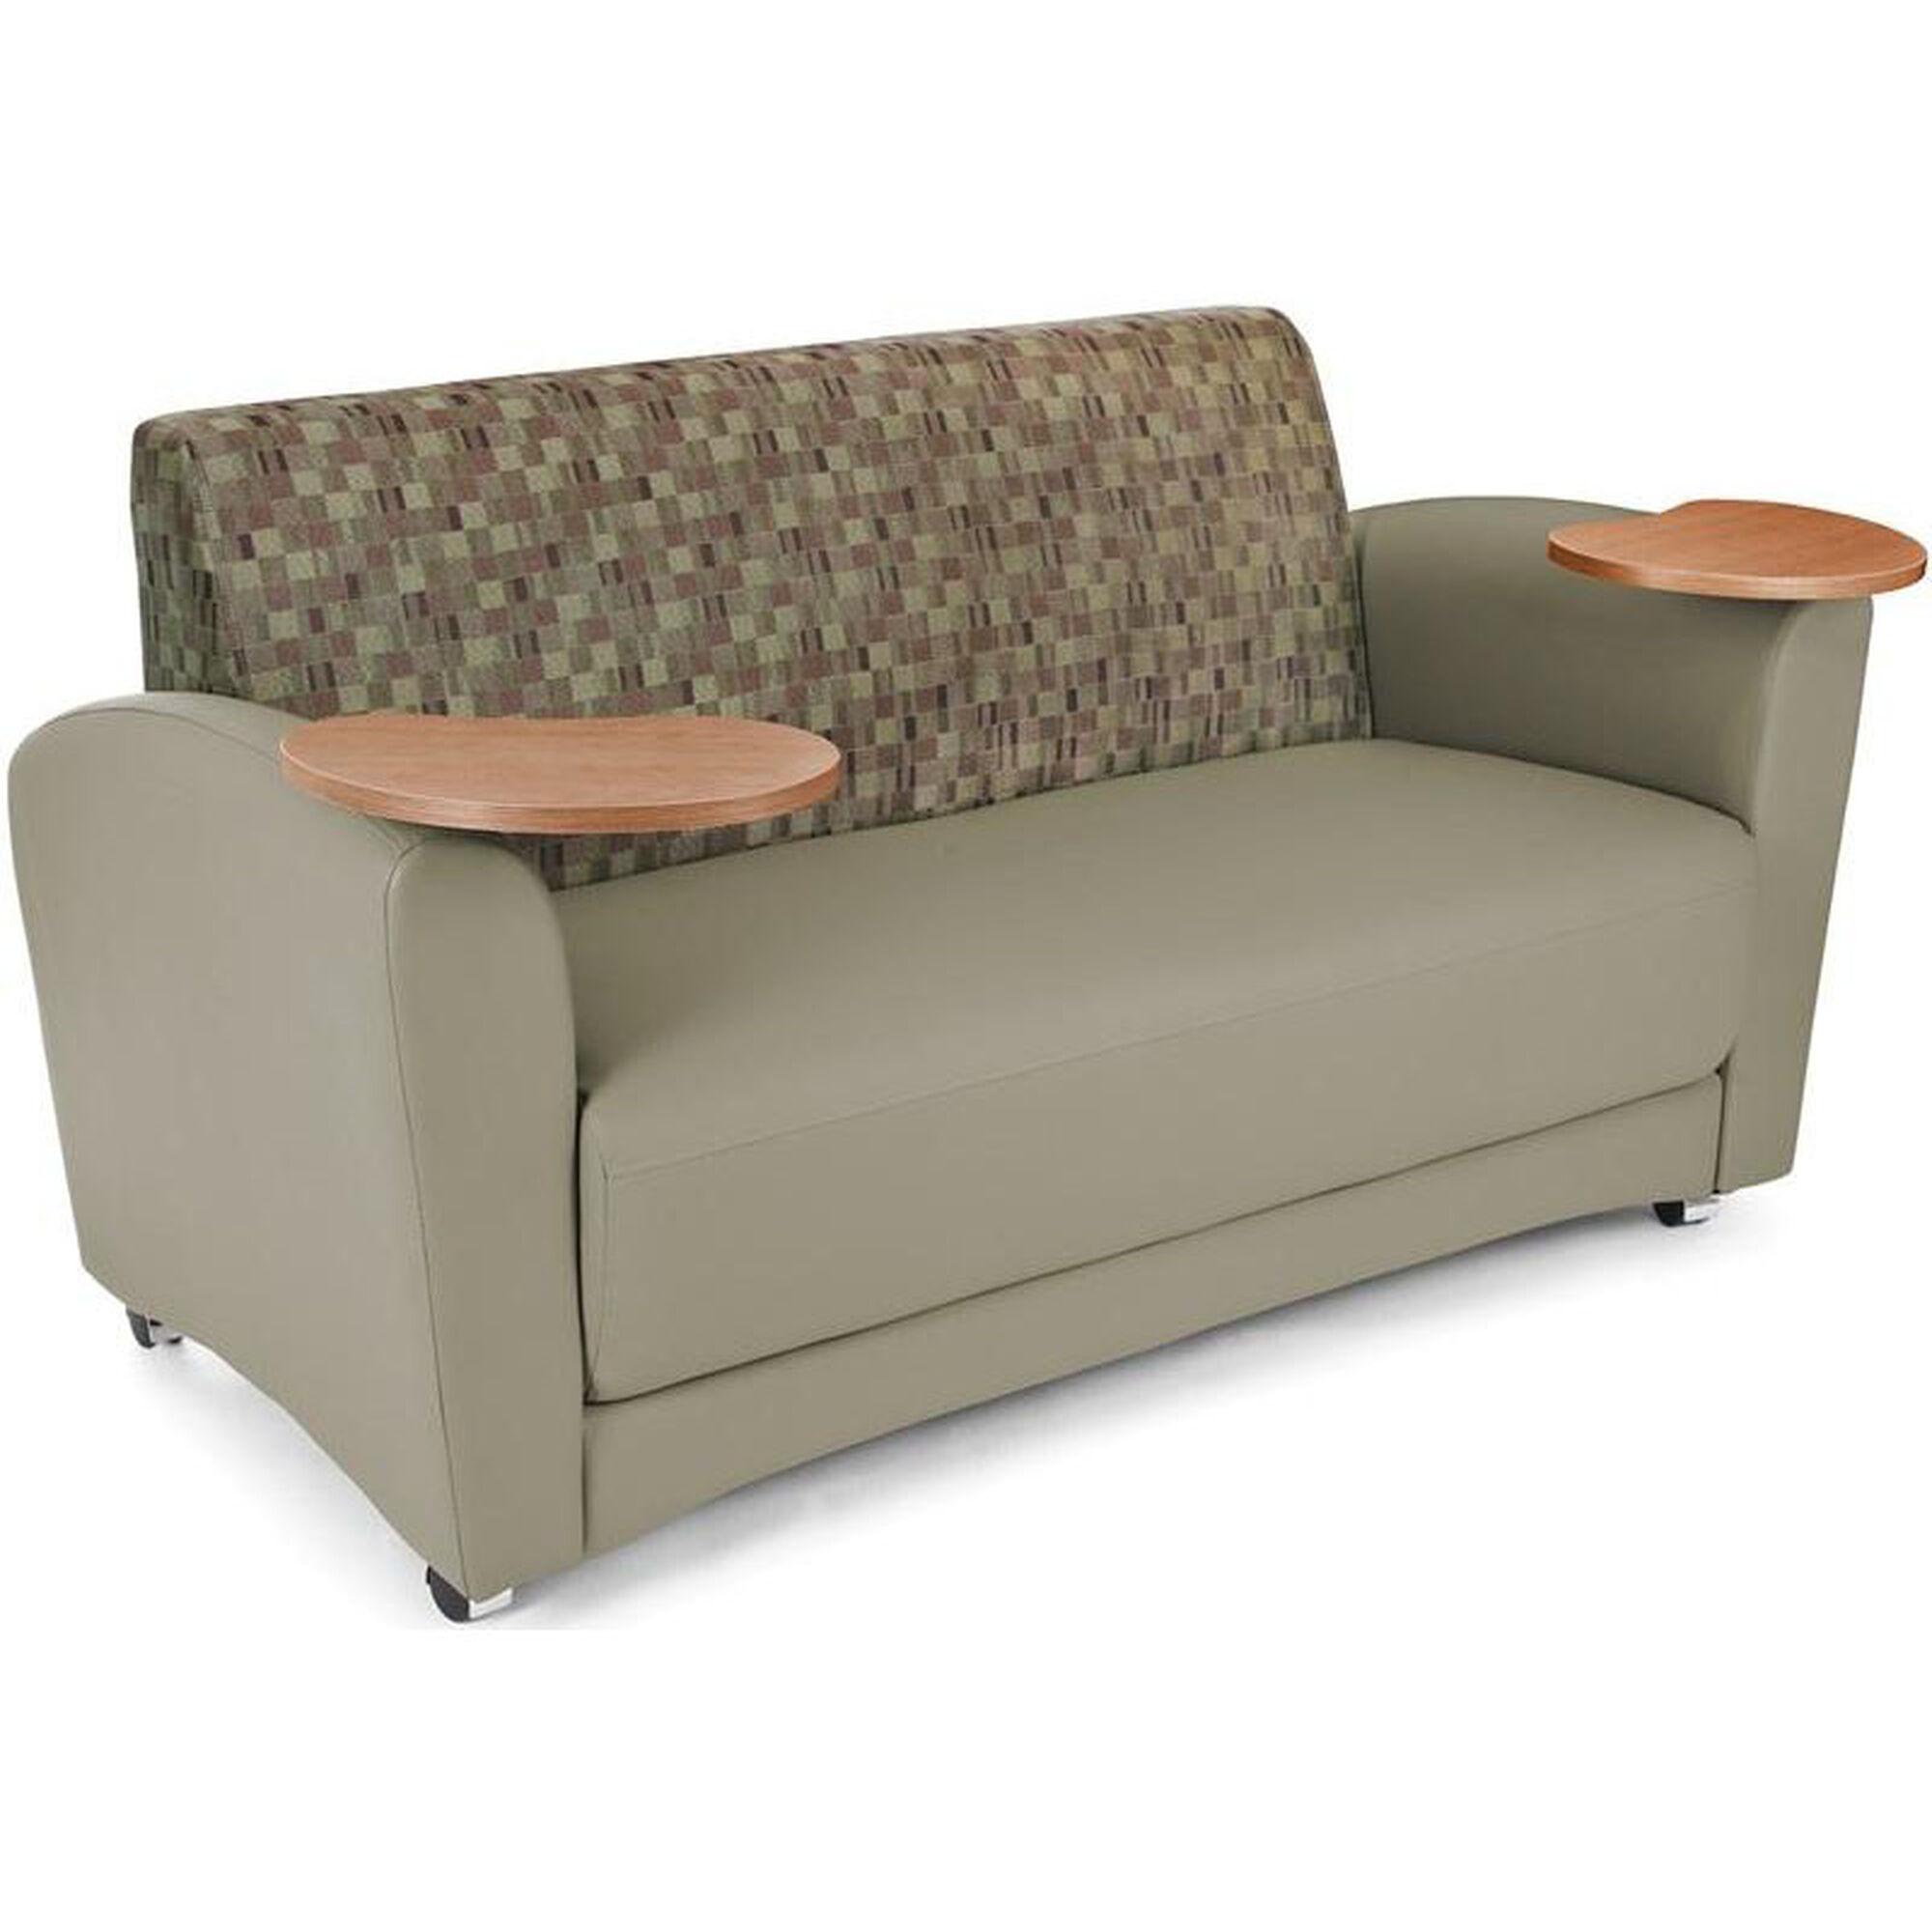 interplay tablet sofa plum taupe 822 p 607 bronz. Black Bedroom Furniture Sets. Home Design Ideas